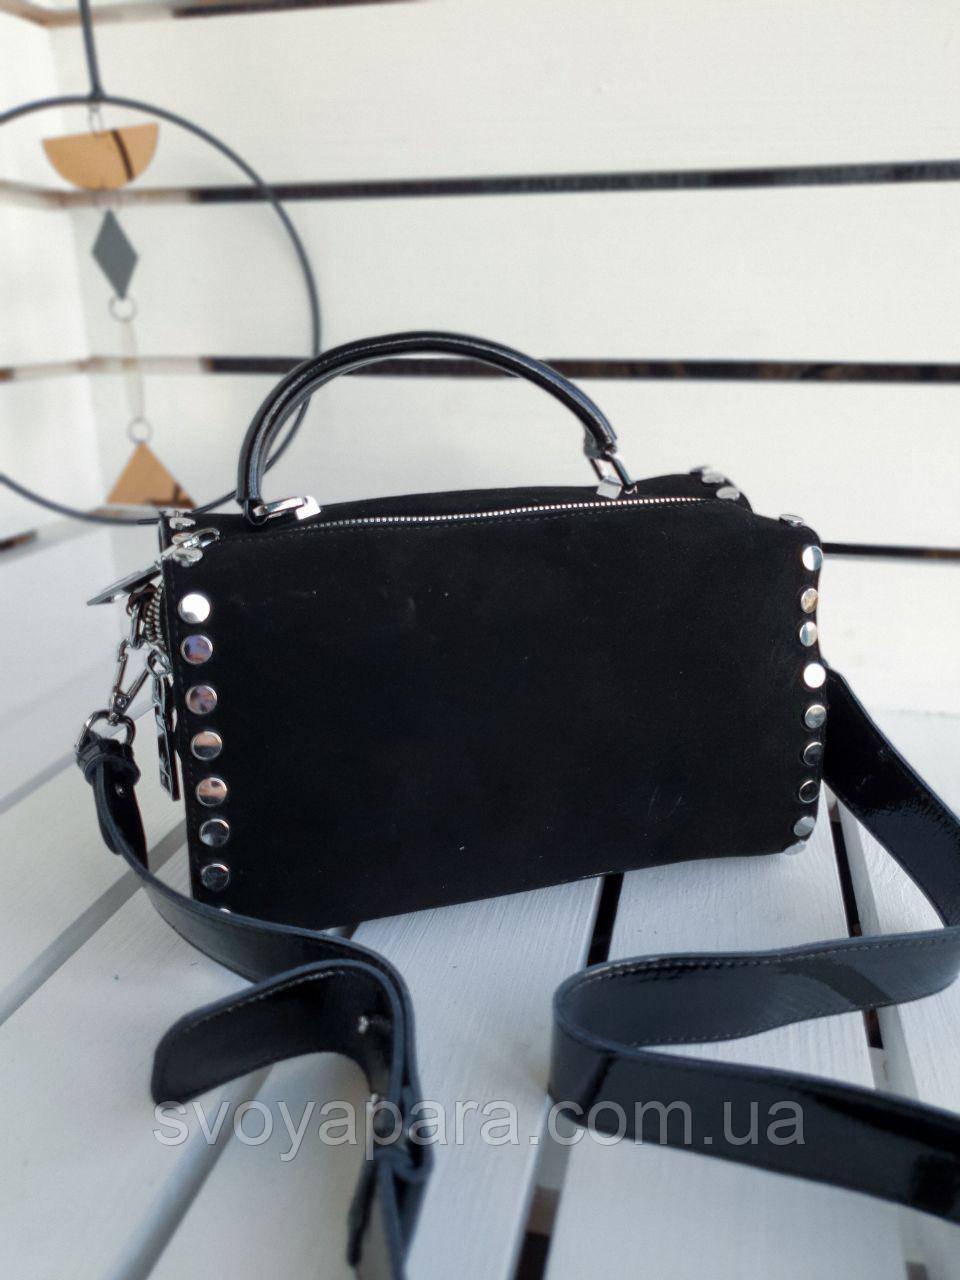 Кожаная-замшевая женская сумка размером 27х16х13 см Черная (01286)